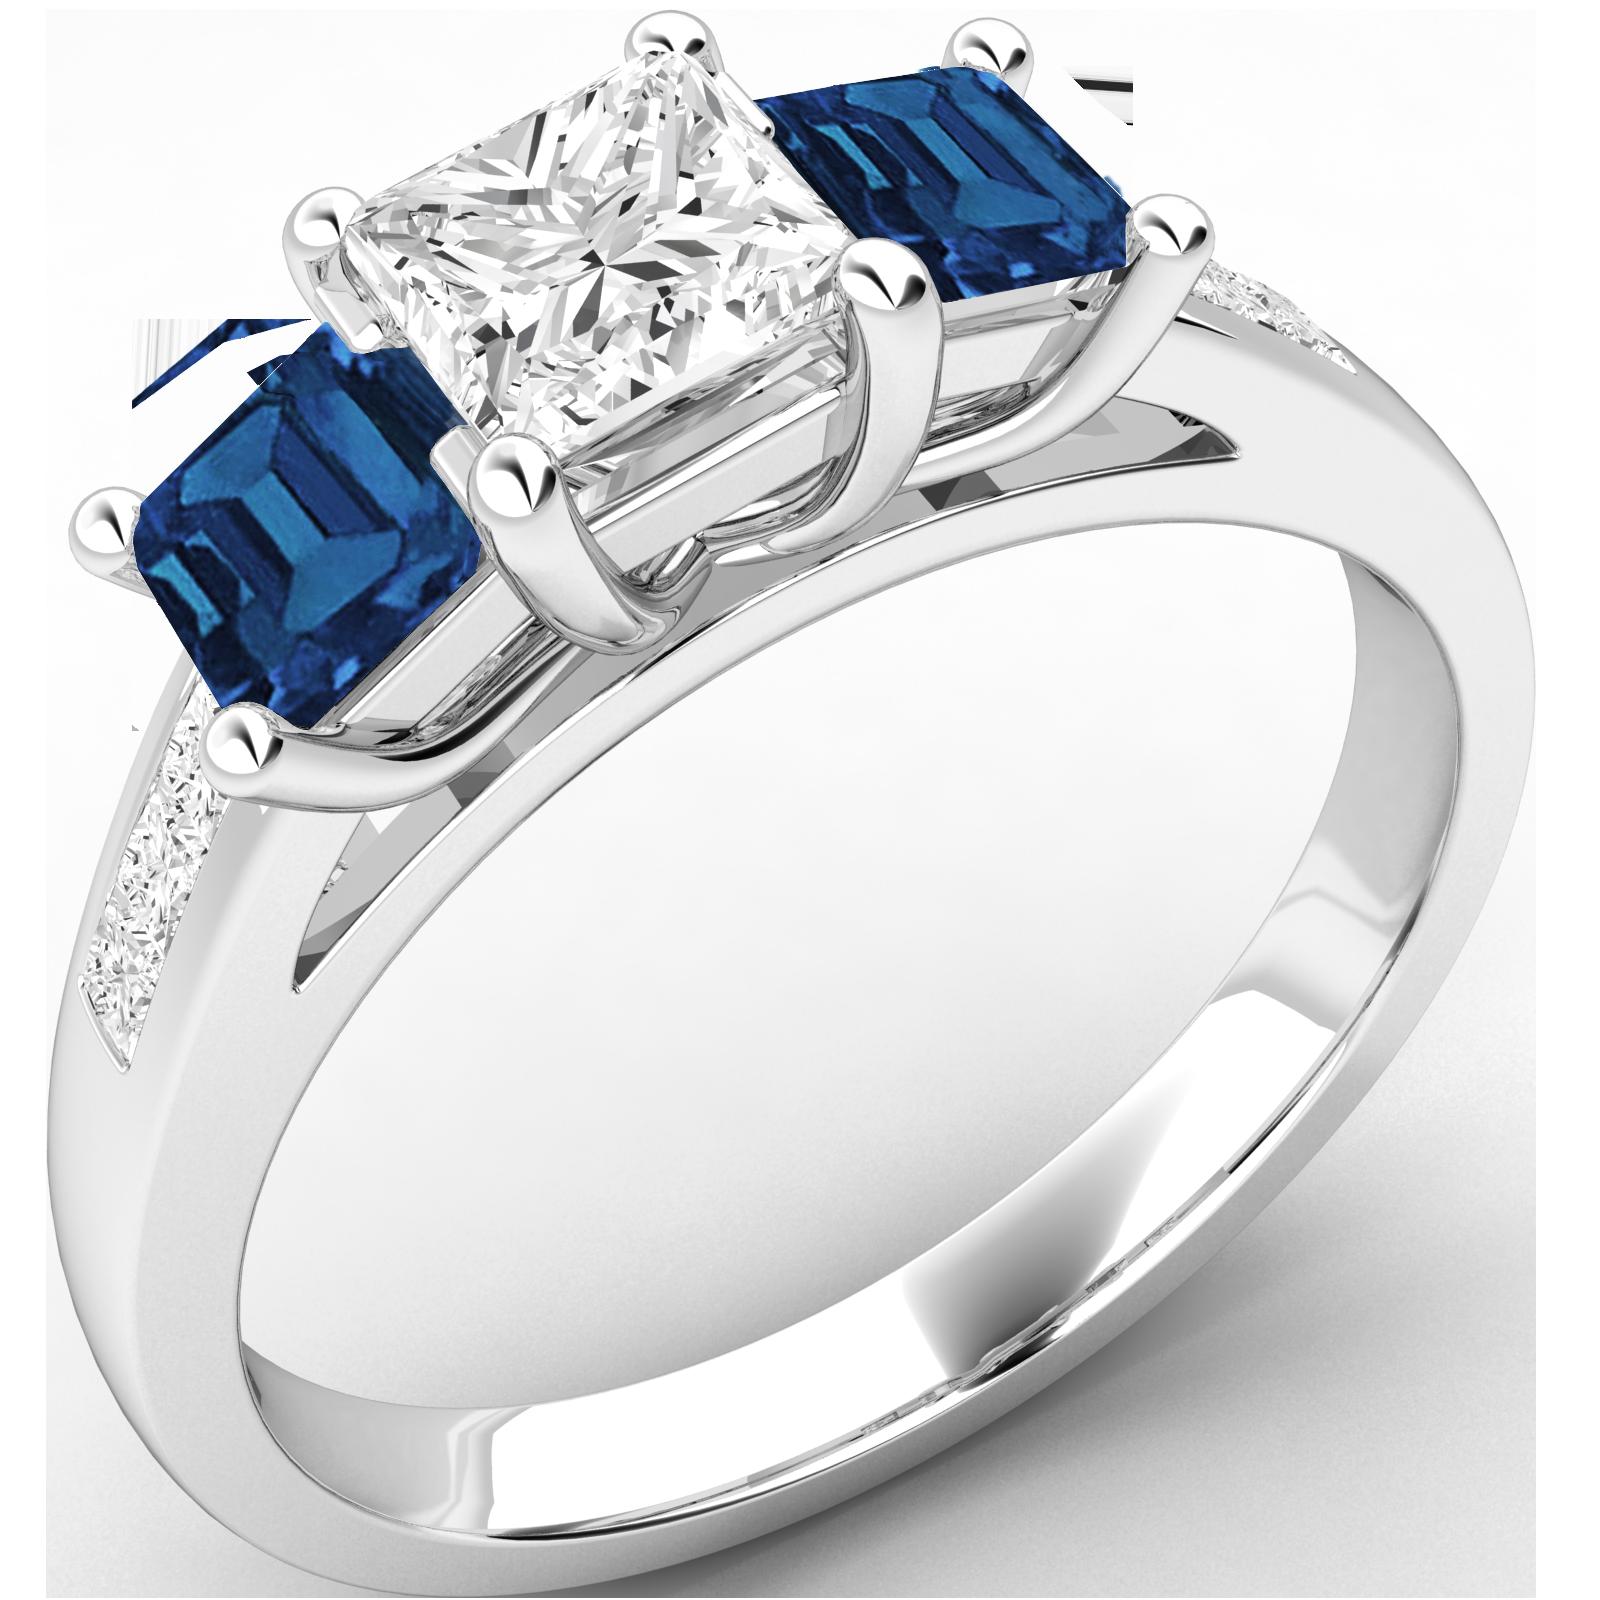 RDSS111W-Inel cu Diamant si Safir Dama Aur Alb 18kt cu un Diamant Taietura Princess in Mijloc si Safir Taiat Patrat pe Fiecsre Parte-img1